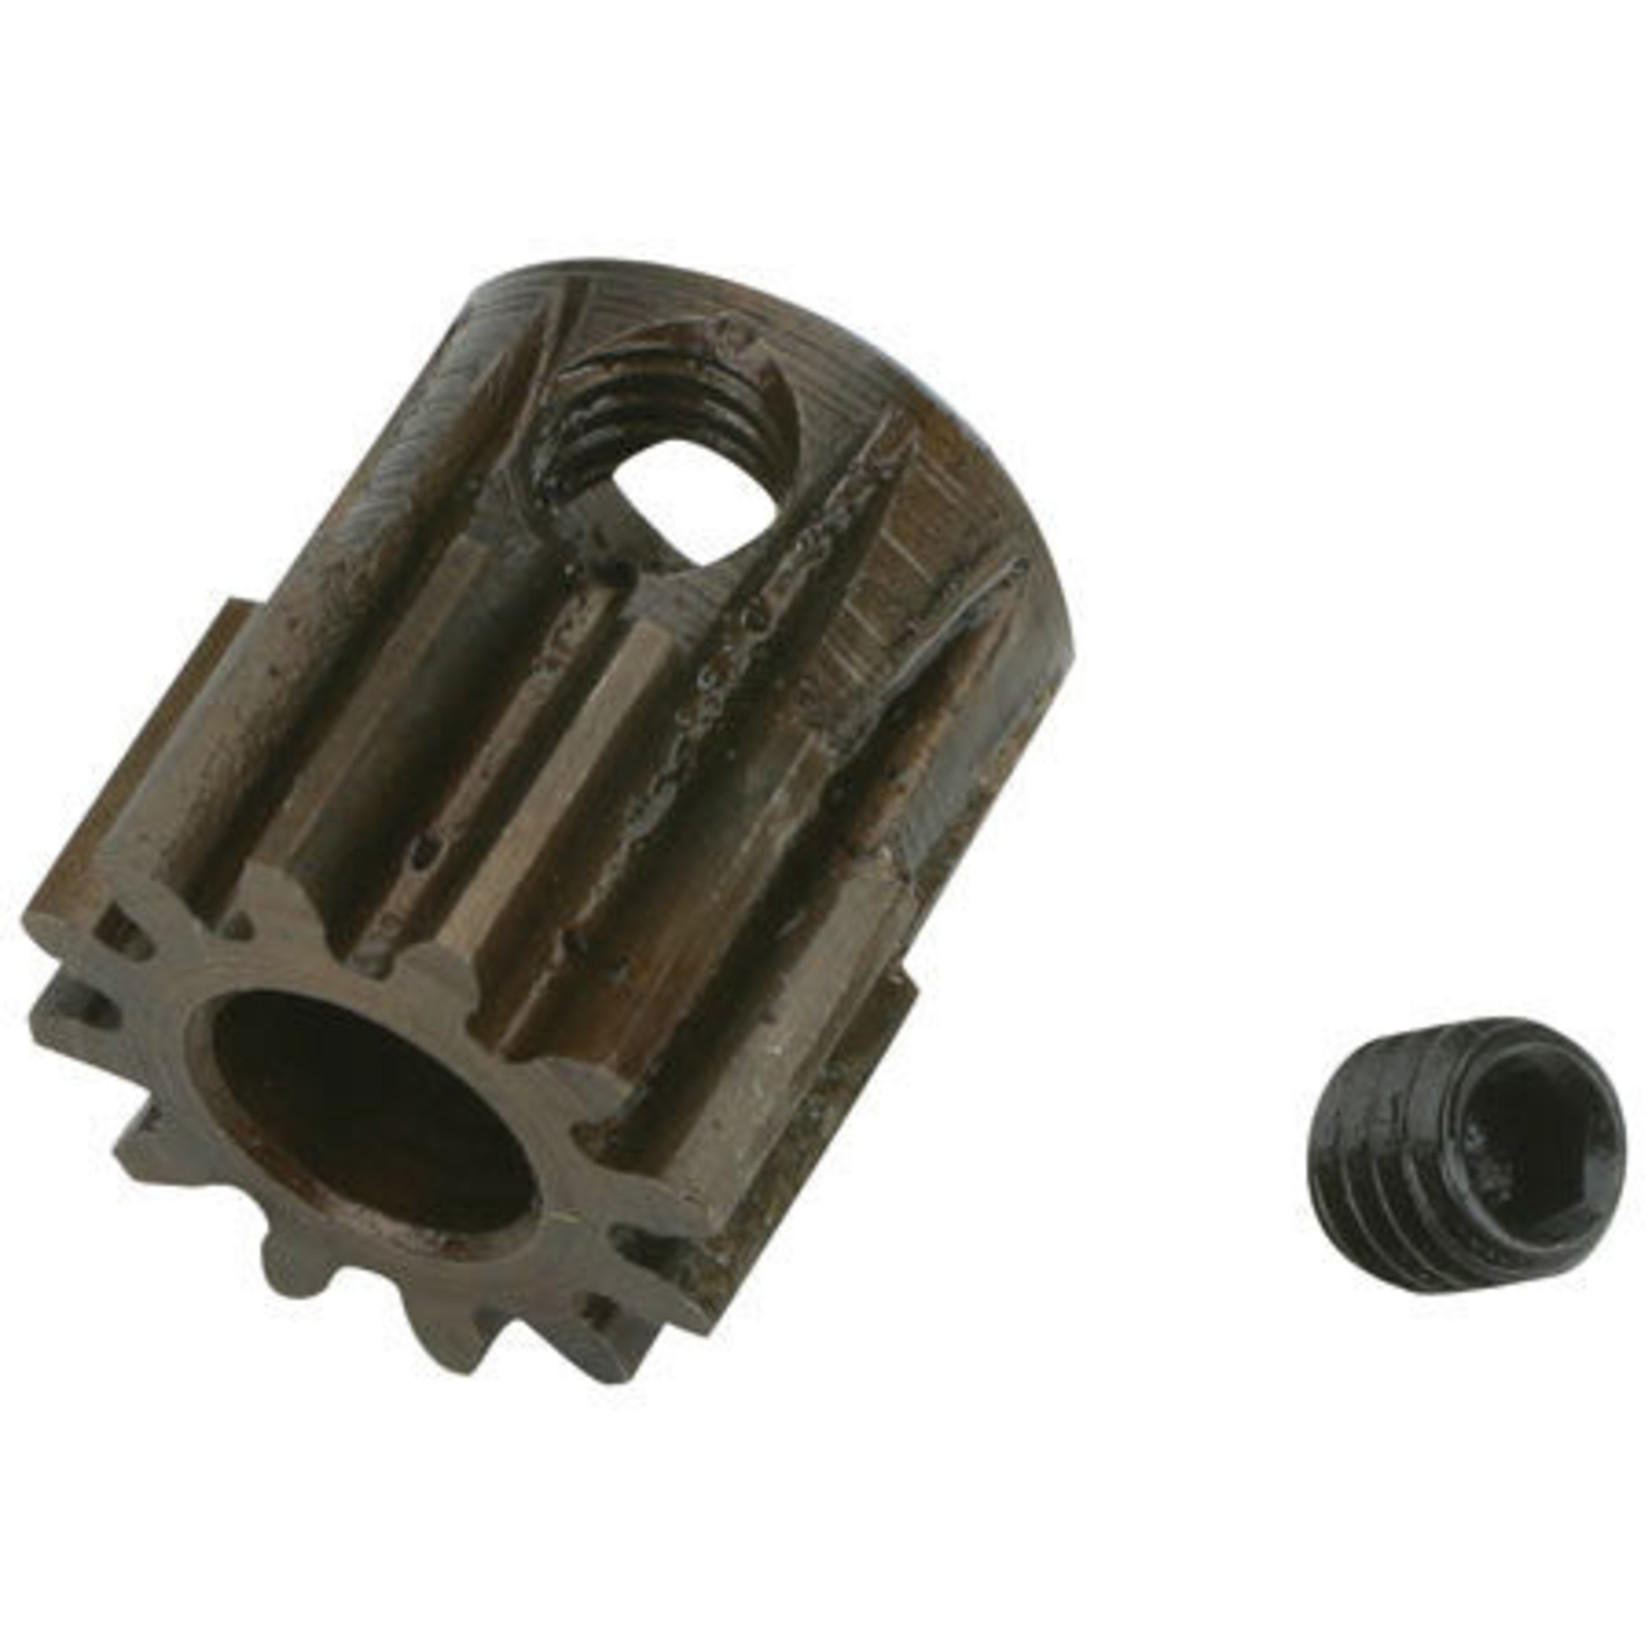 Robinson Racing Products RRP8712 Robinson Racing Extra Hard Steel .8 Mod Pinion Gear w/5mm Bore (12T)